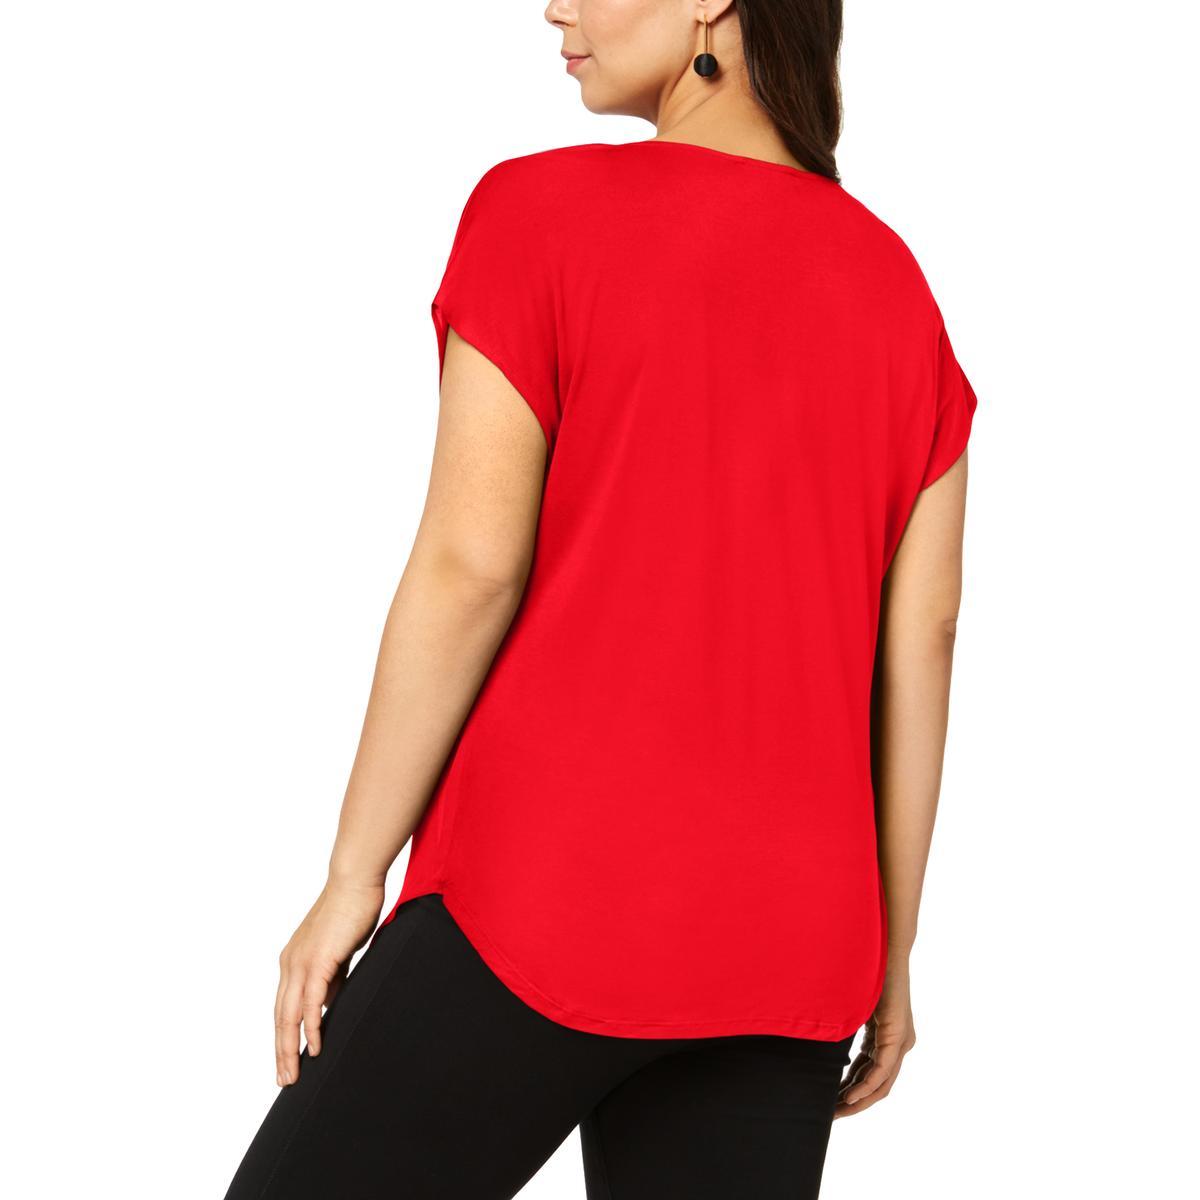 INC Womens Pleated Vneck V-Neck Career Wear Shirt Blouse Top BHFO 5271